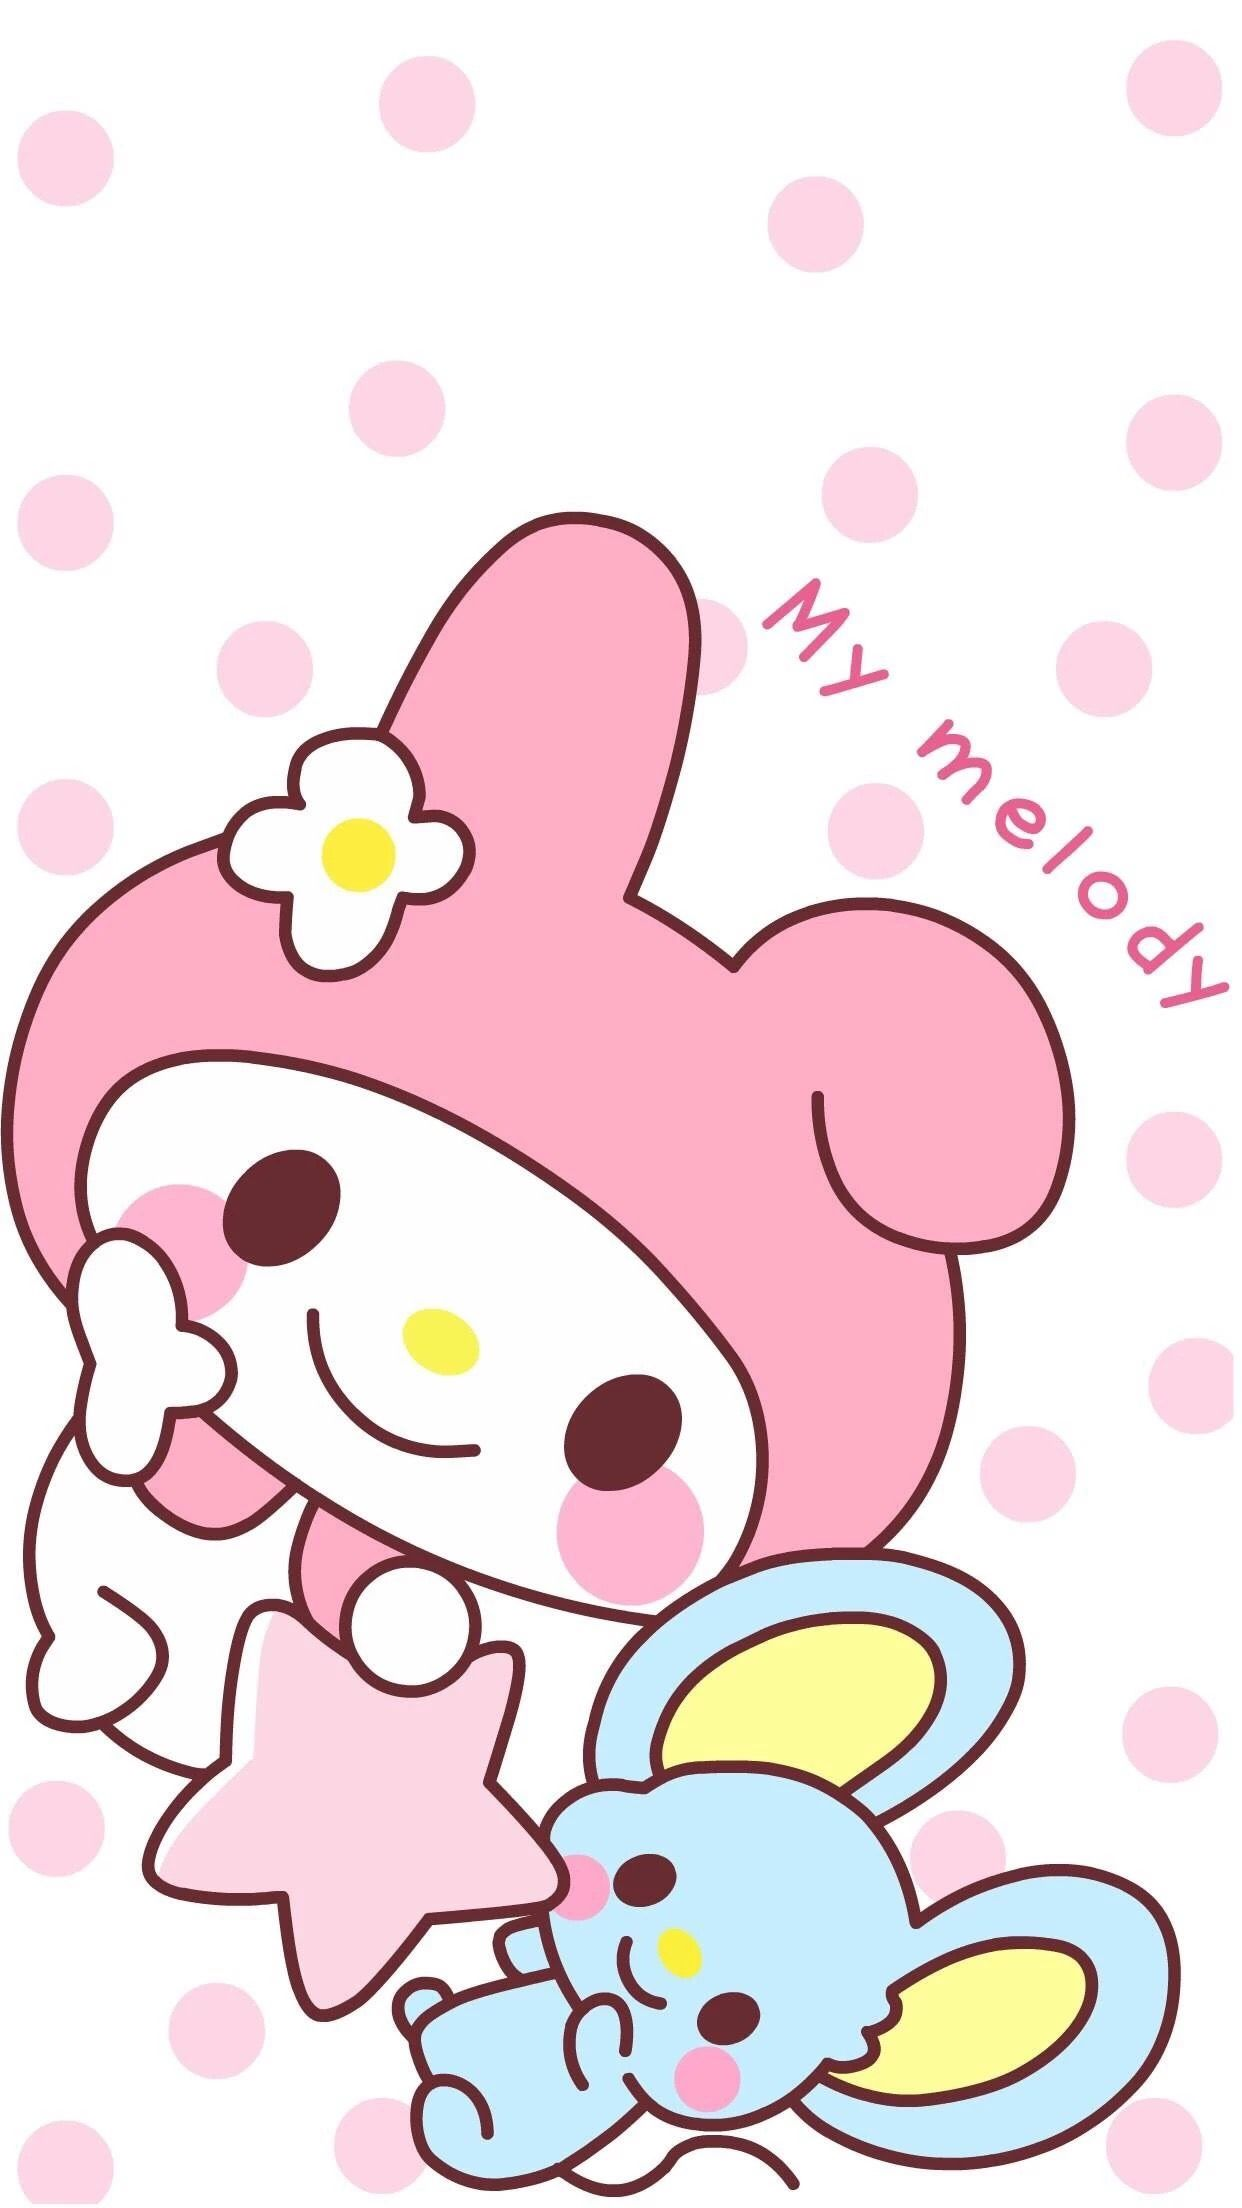 ʚ ɞ Pinterest Horrorbaby Hello Kitty Pictures Hello Kitty